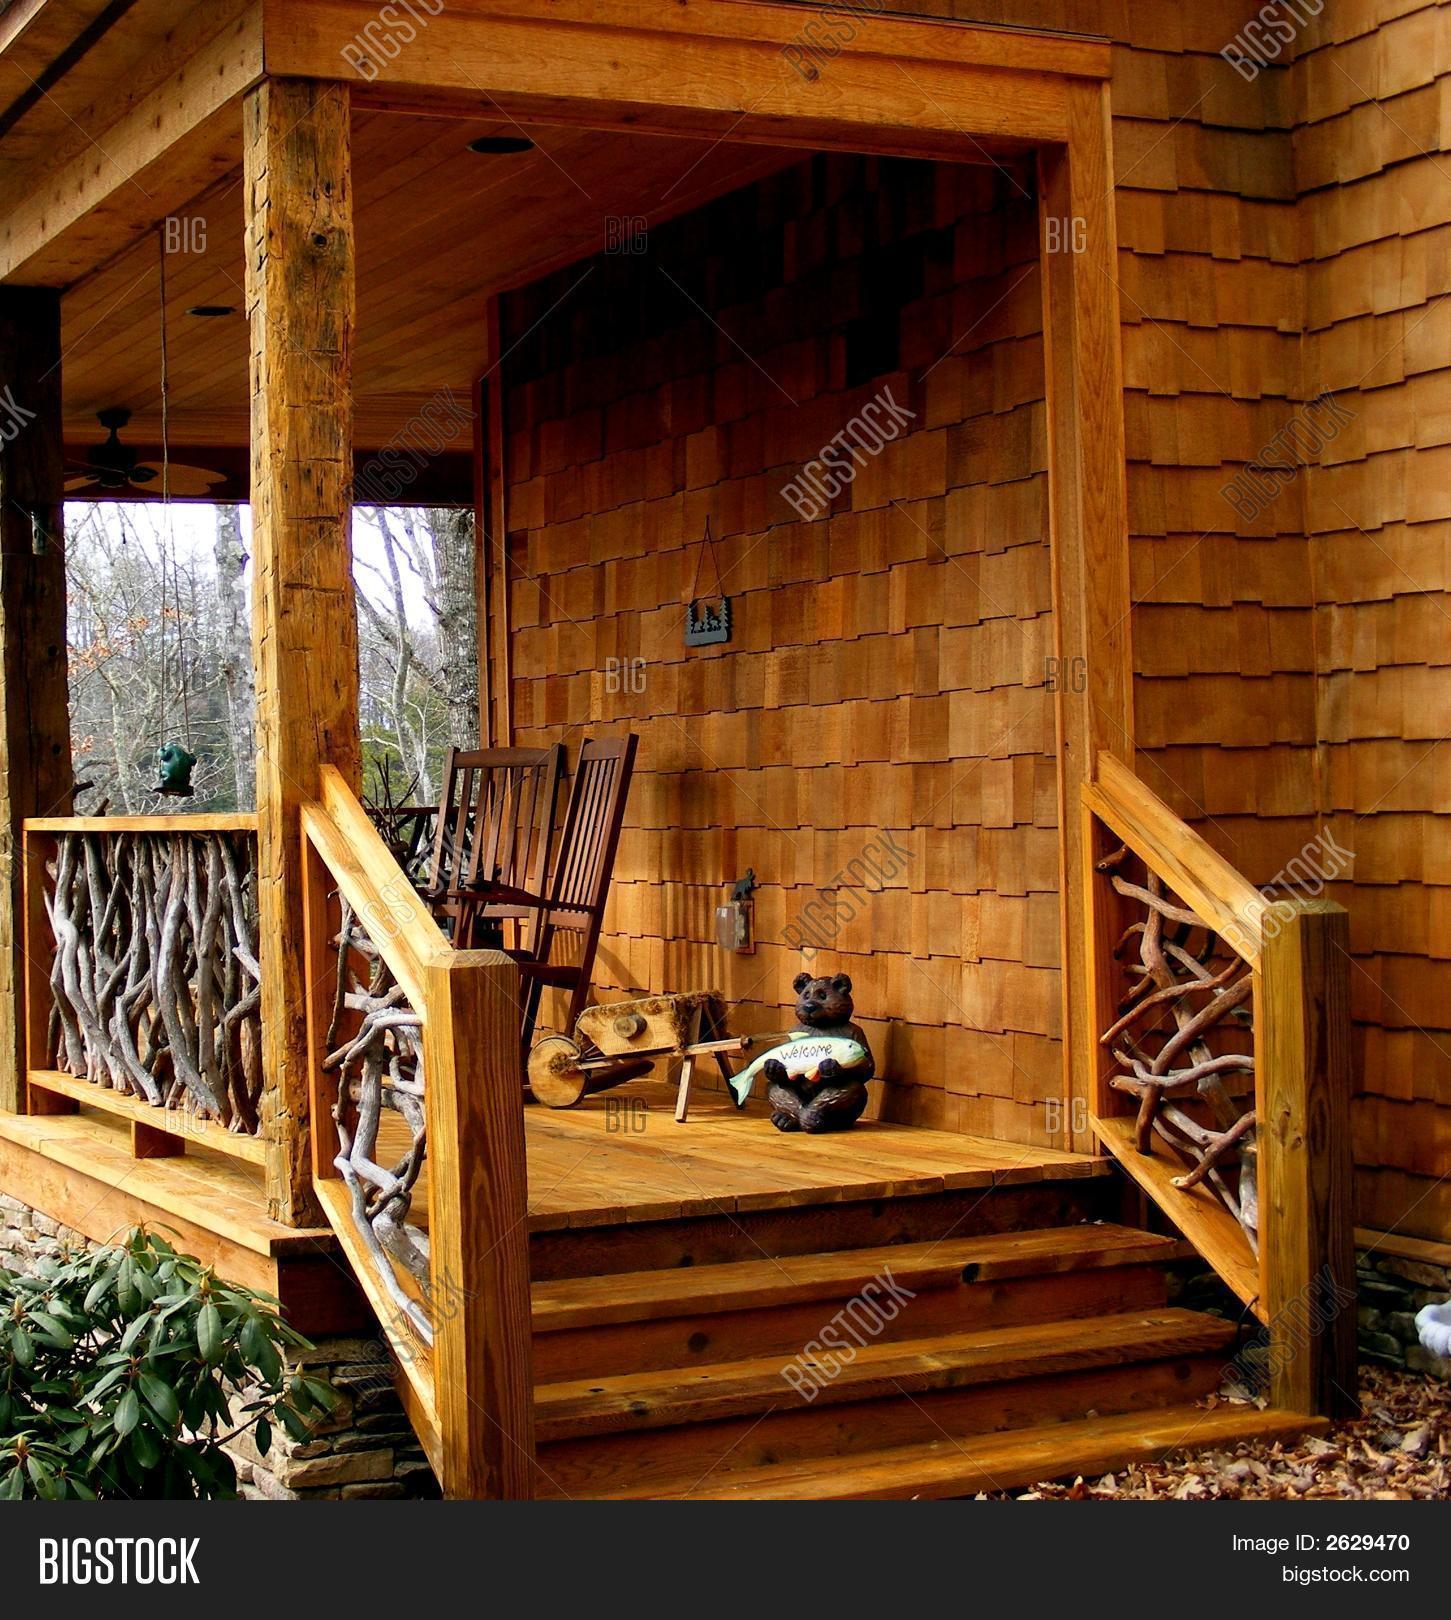 Country Home Deck - Unique Railing Image & Photo